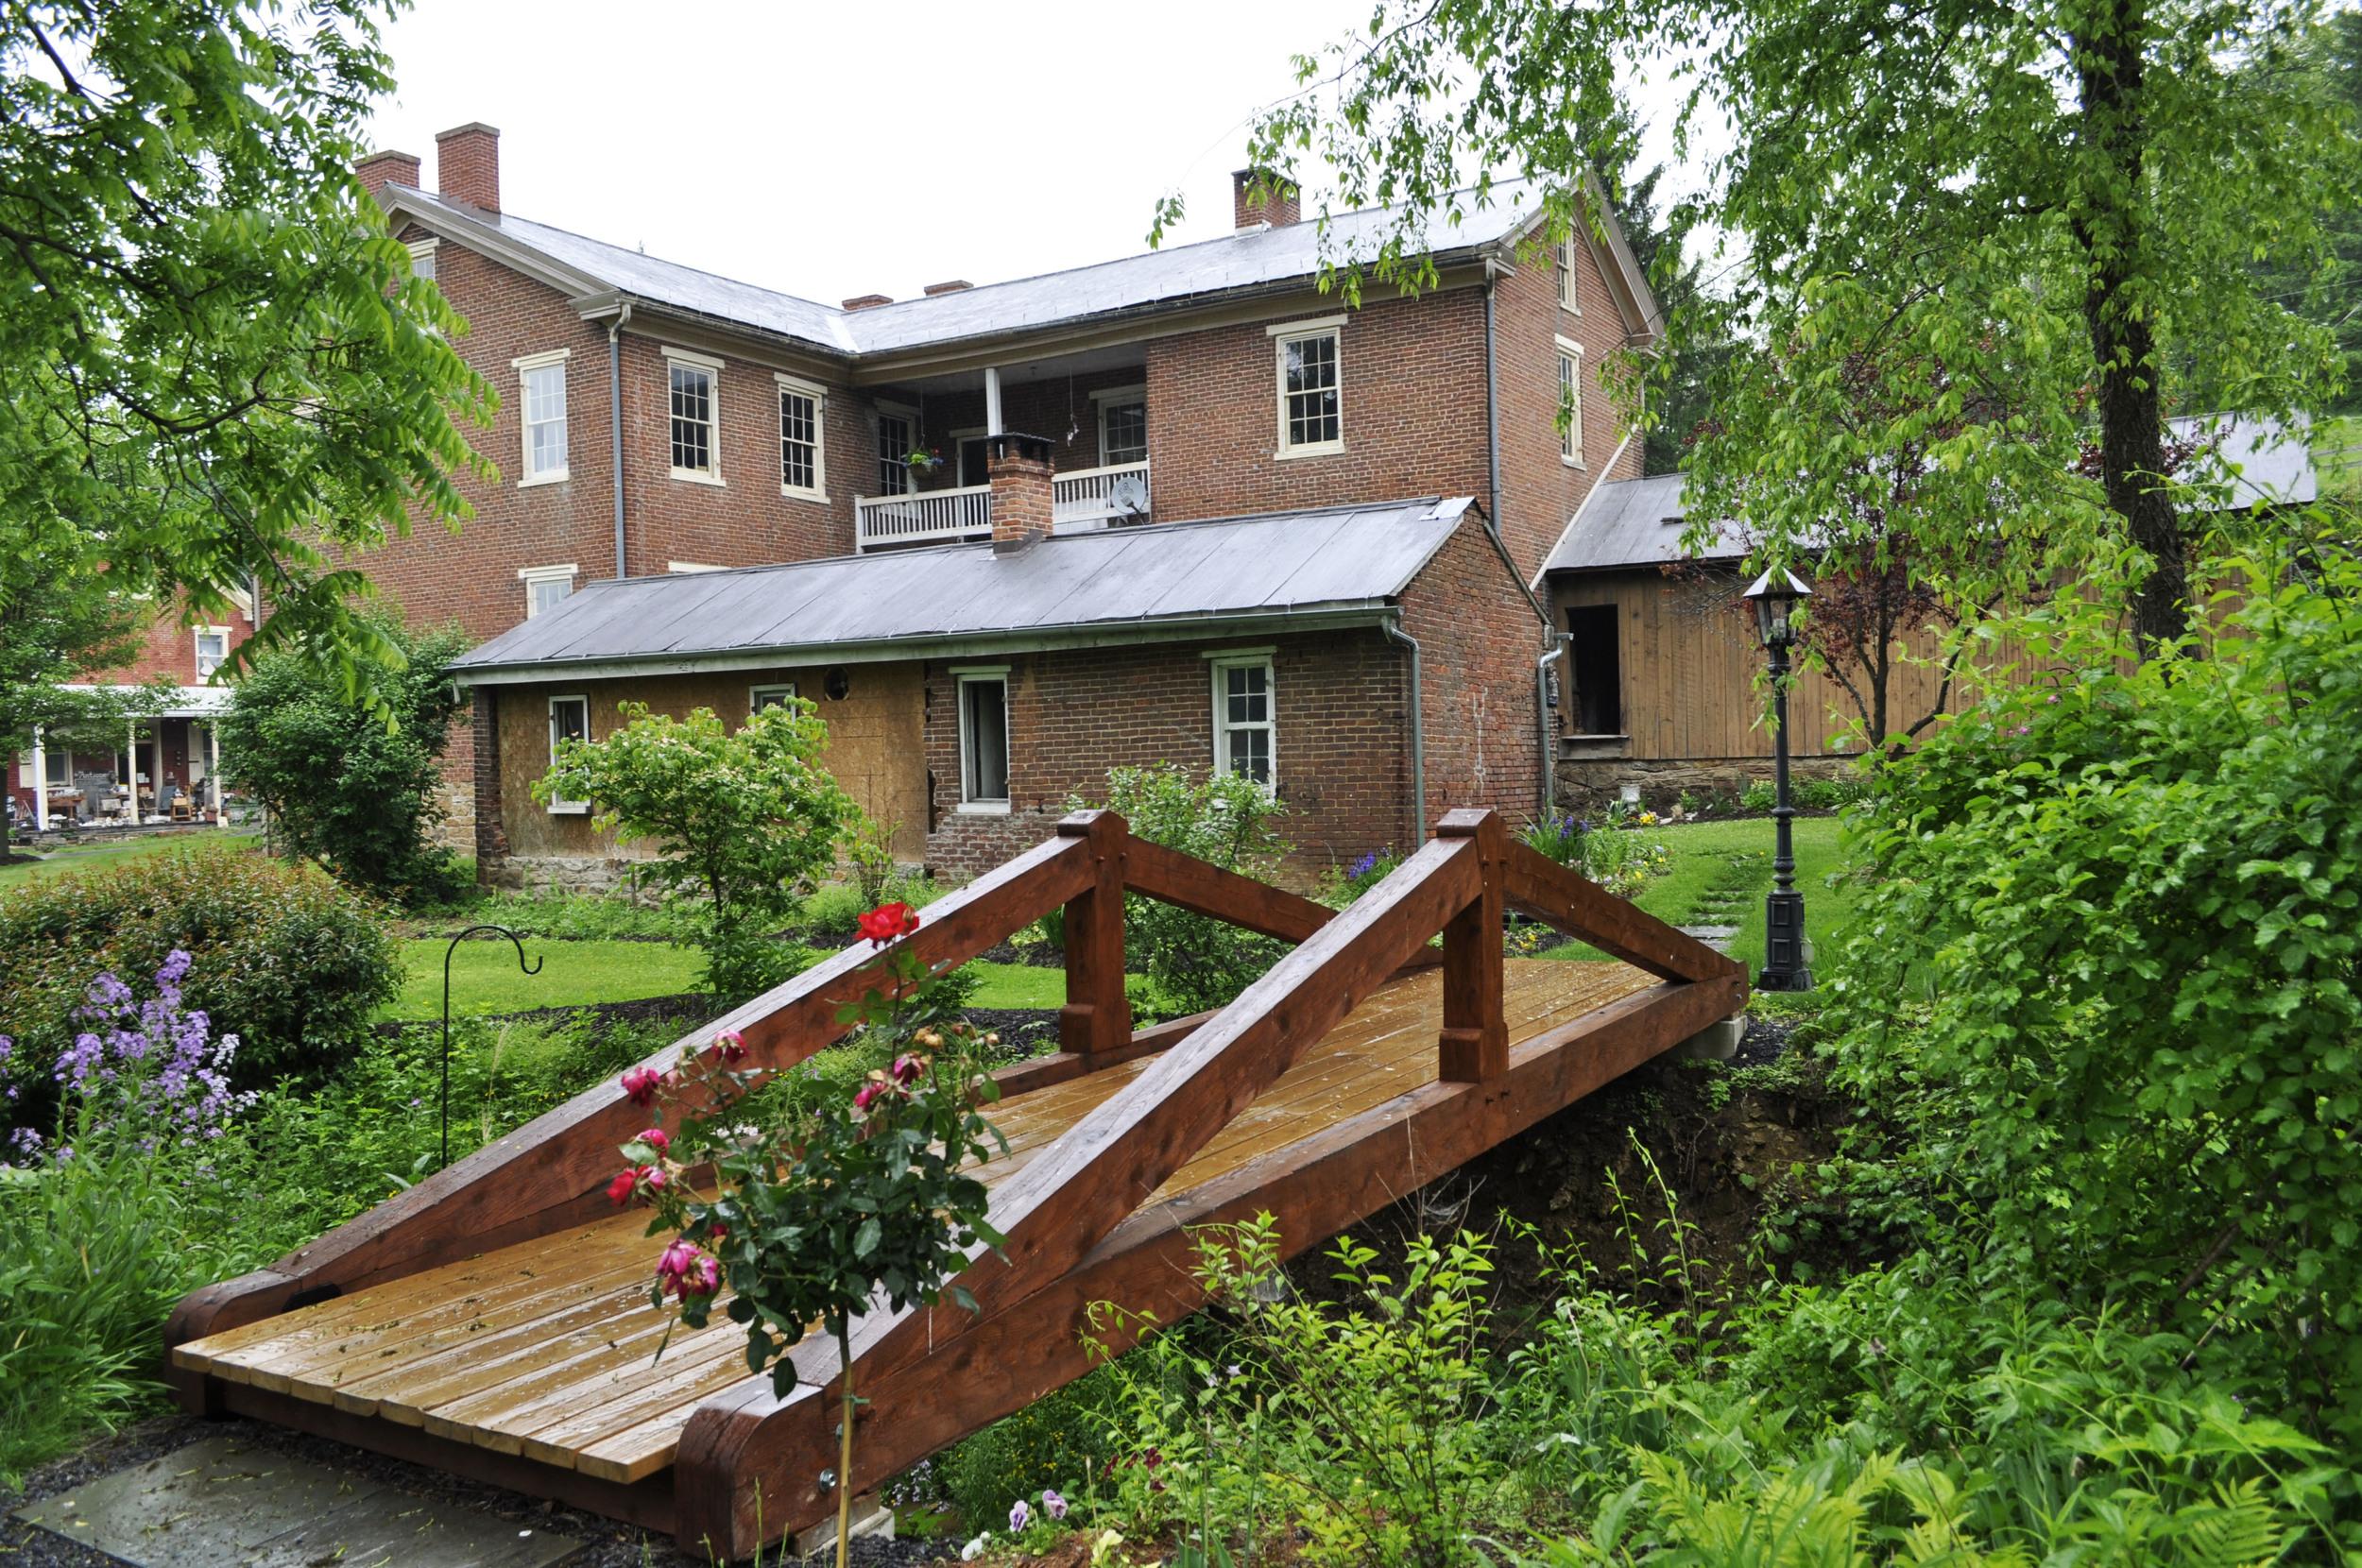 McBurney Manor: LeFevre Bakery's first location in Huntingdon, PA